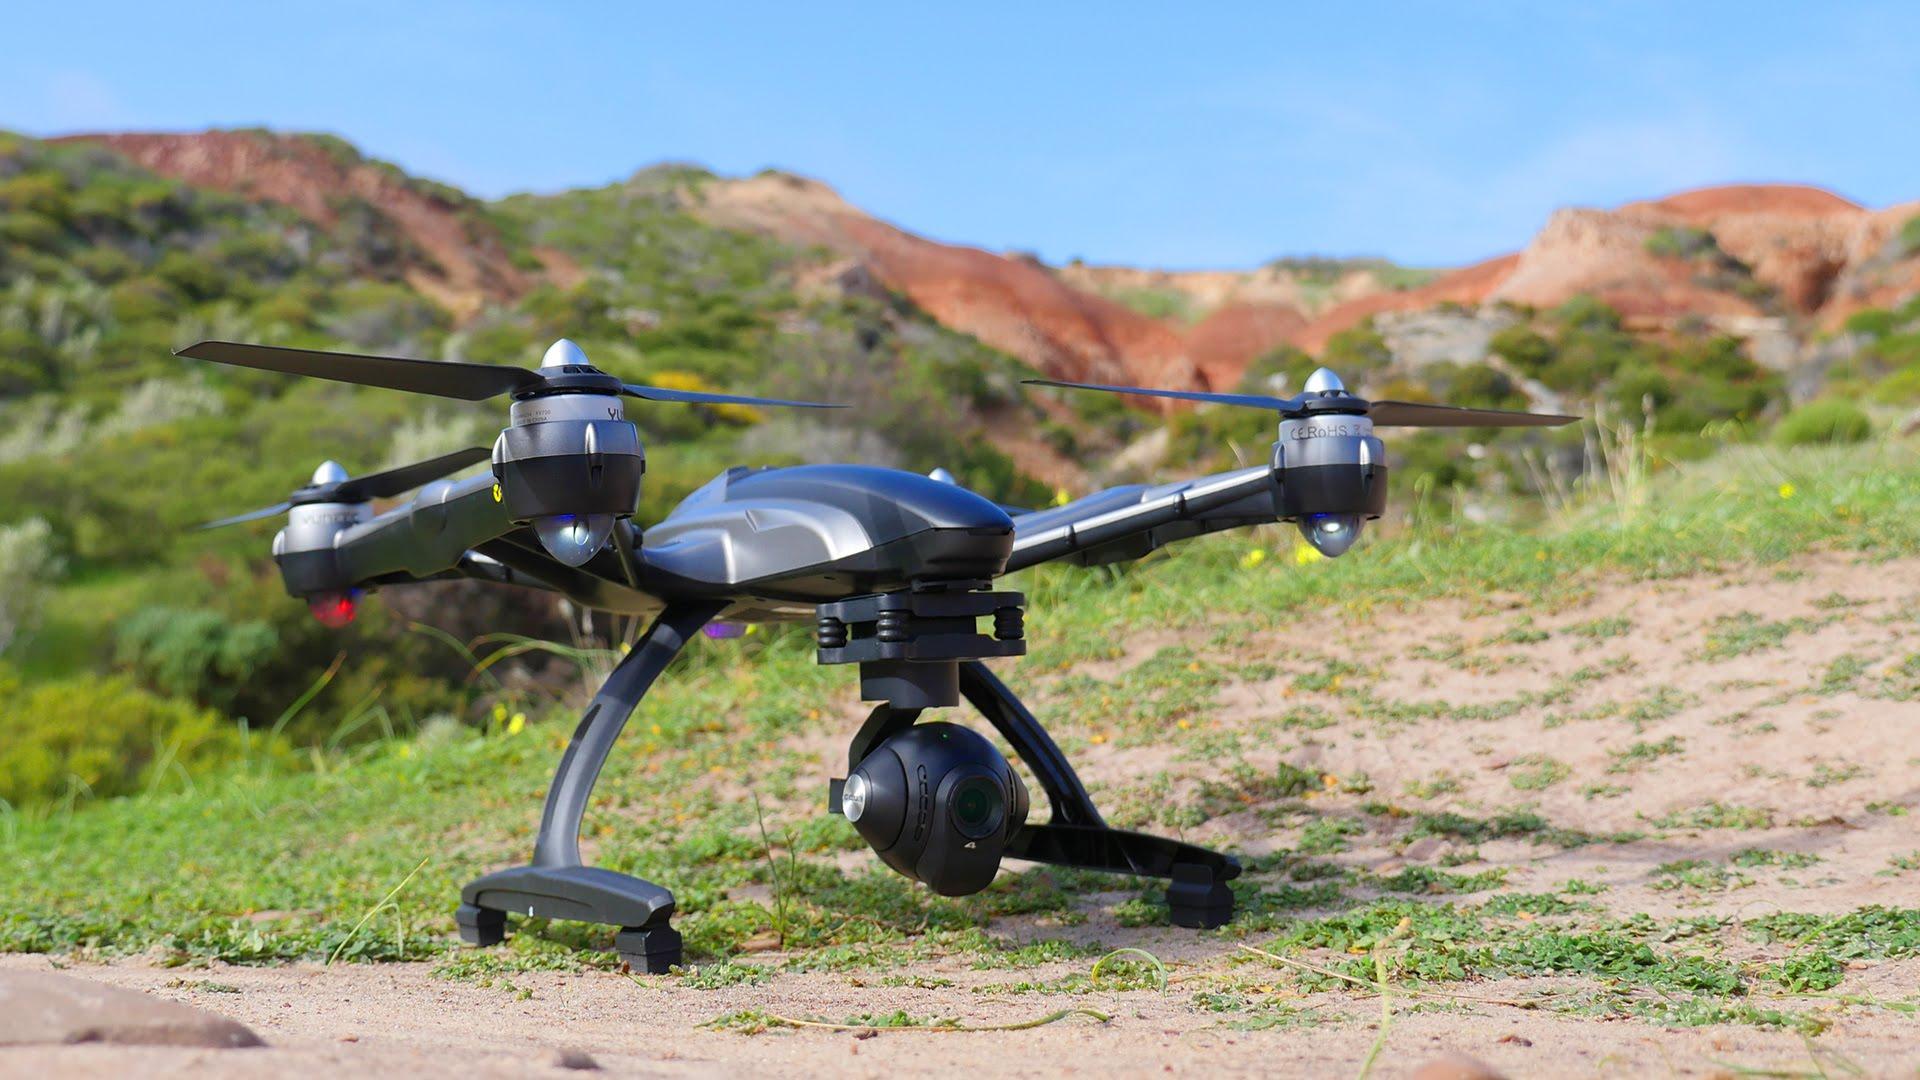 Yuneec Typhoon Q500 квадрокоптер с GPS и 4K камерой